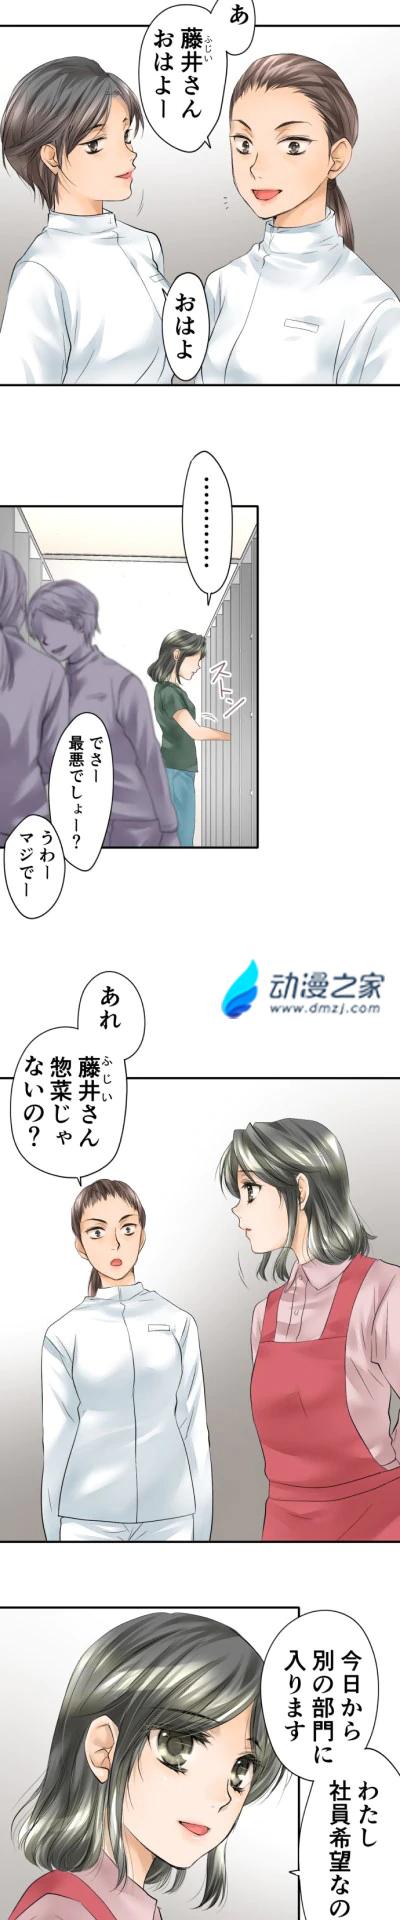 bokufuta_01.webp.jpg